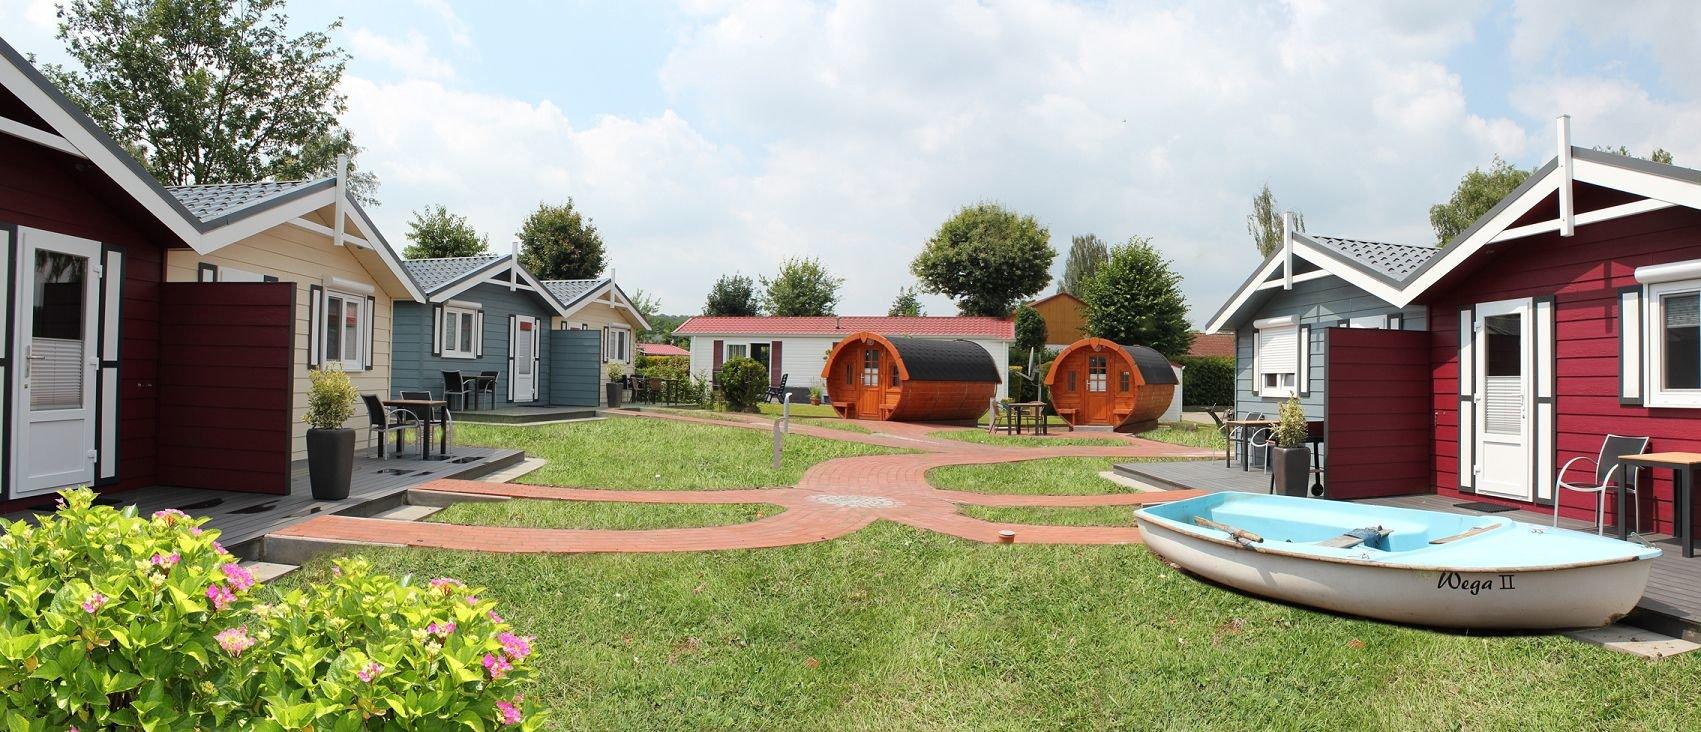 Ferienbungalow Campingplatz Datteln